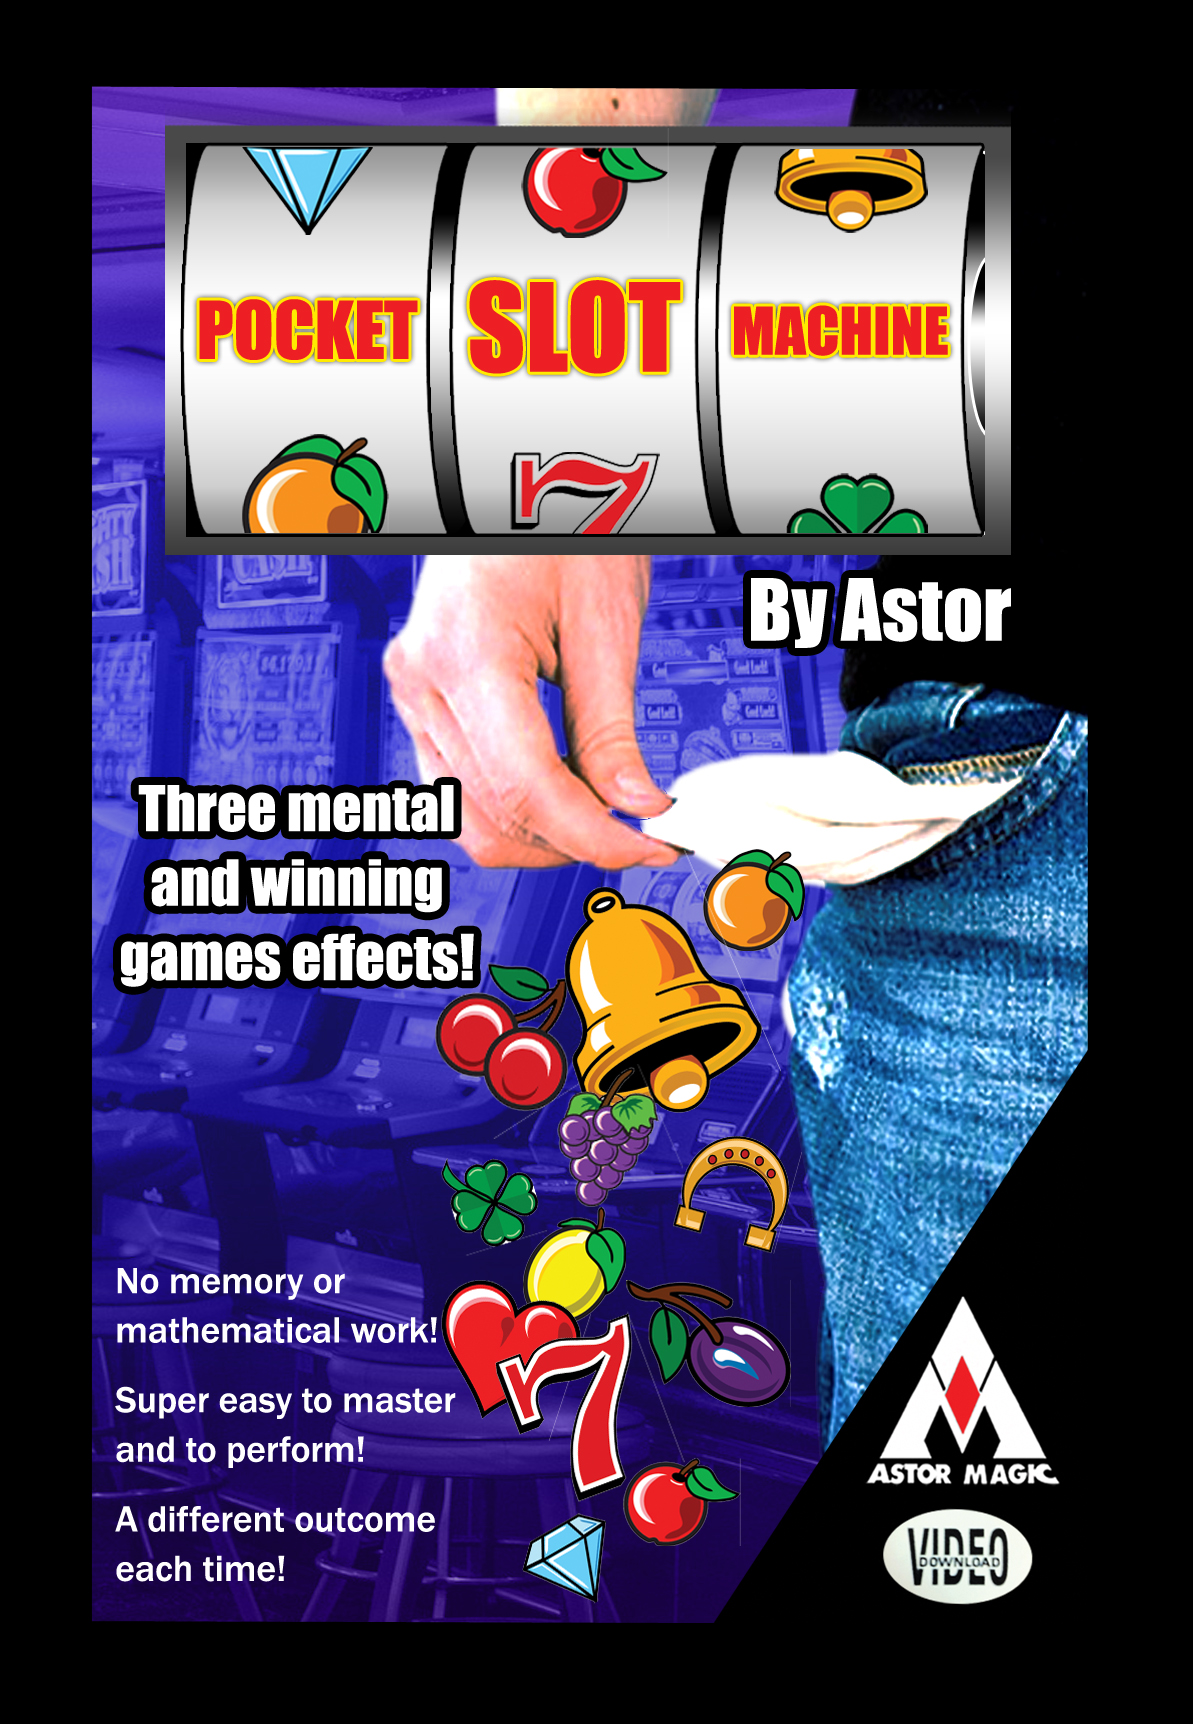 POCKET SLOT MACHINE - Astor Magic